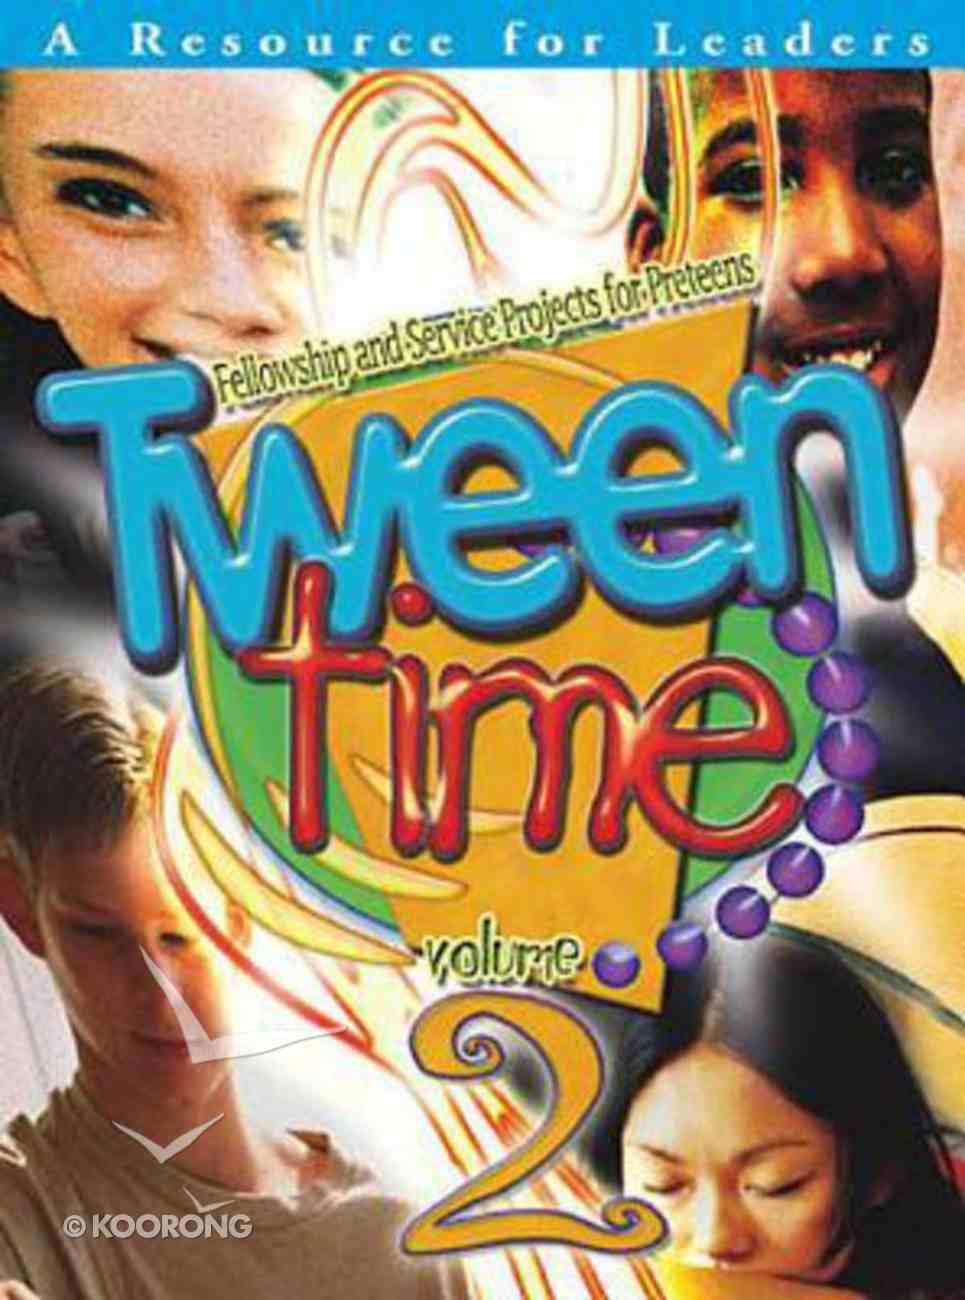 Tween Time Volume 2 (Leader's Guide) Paperback